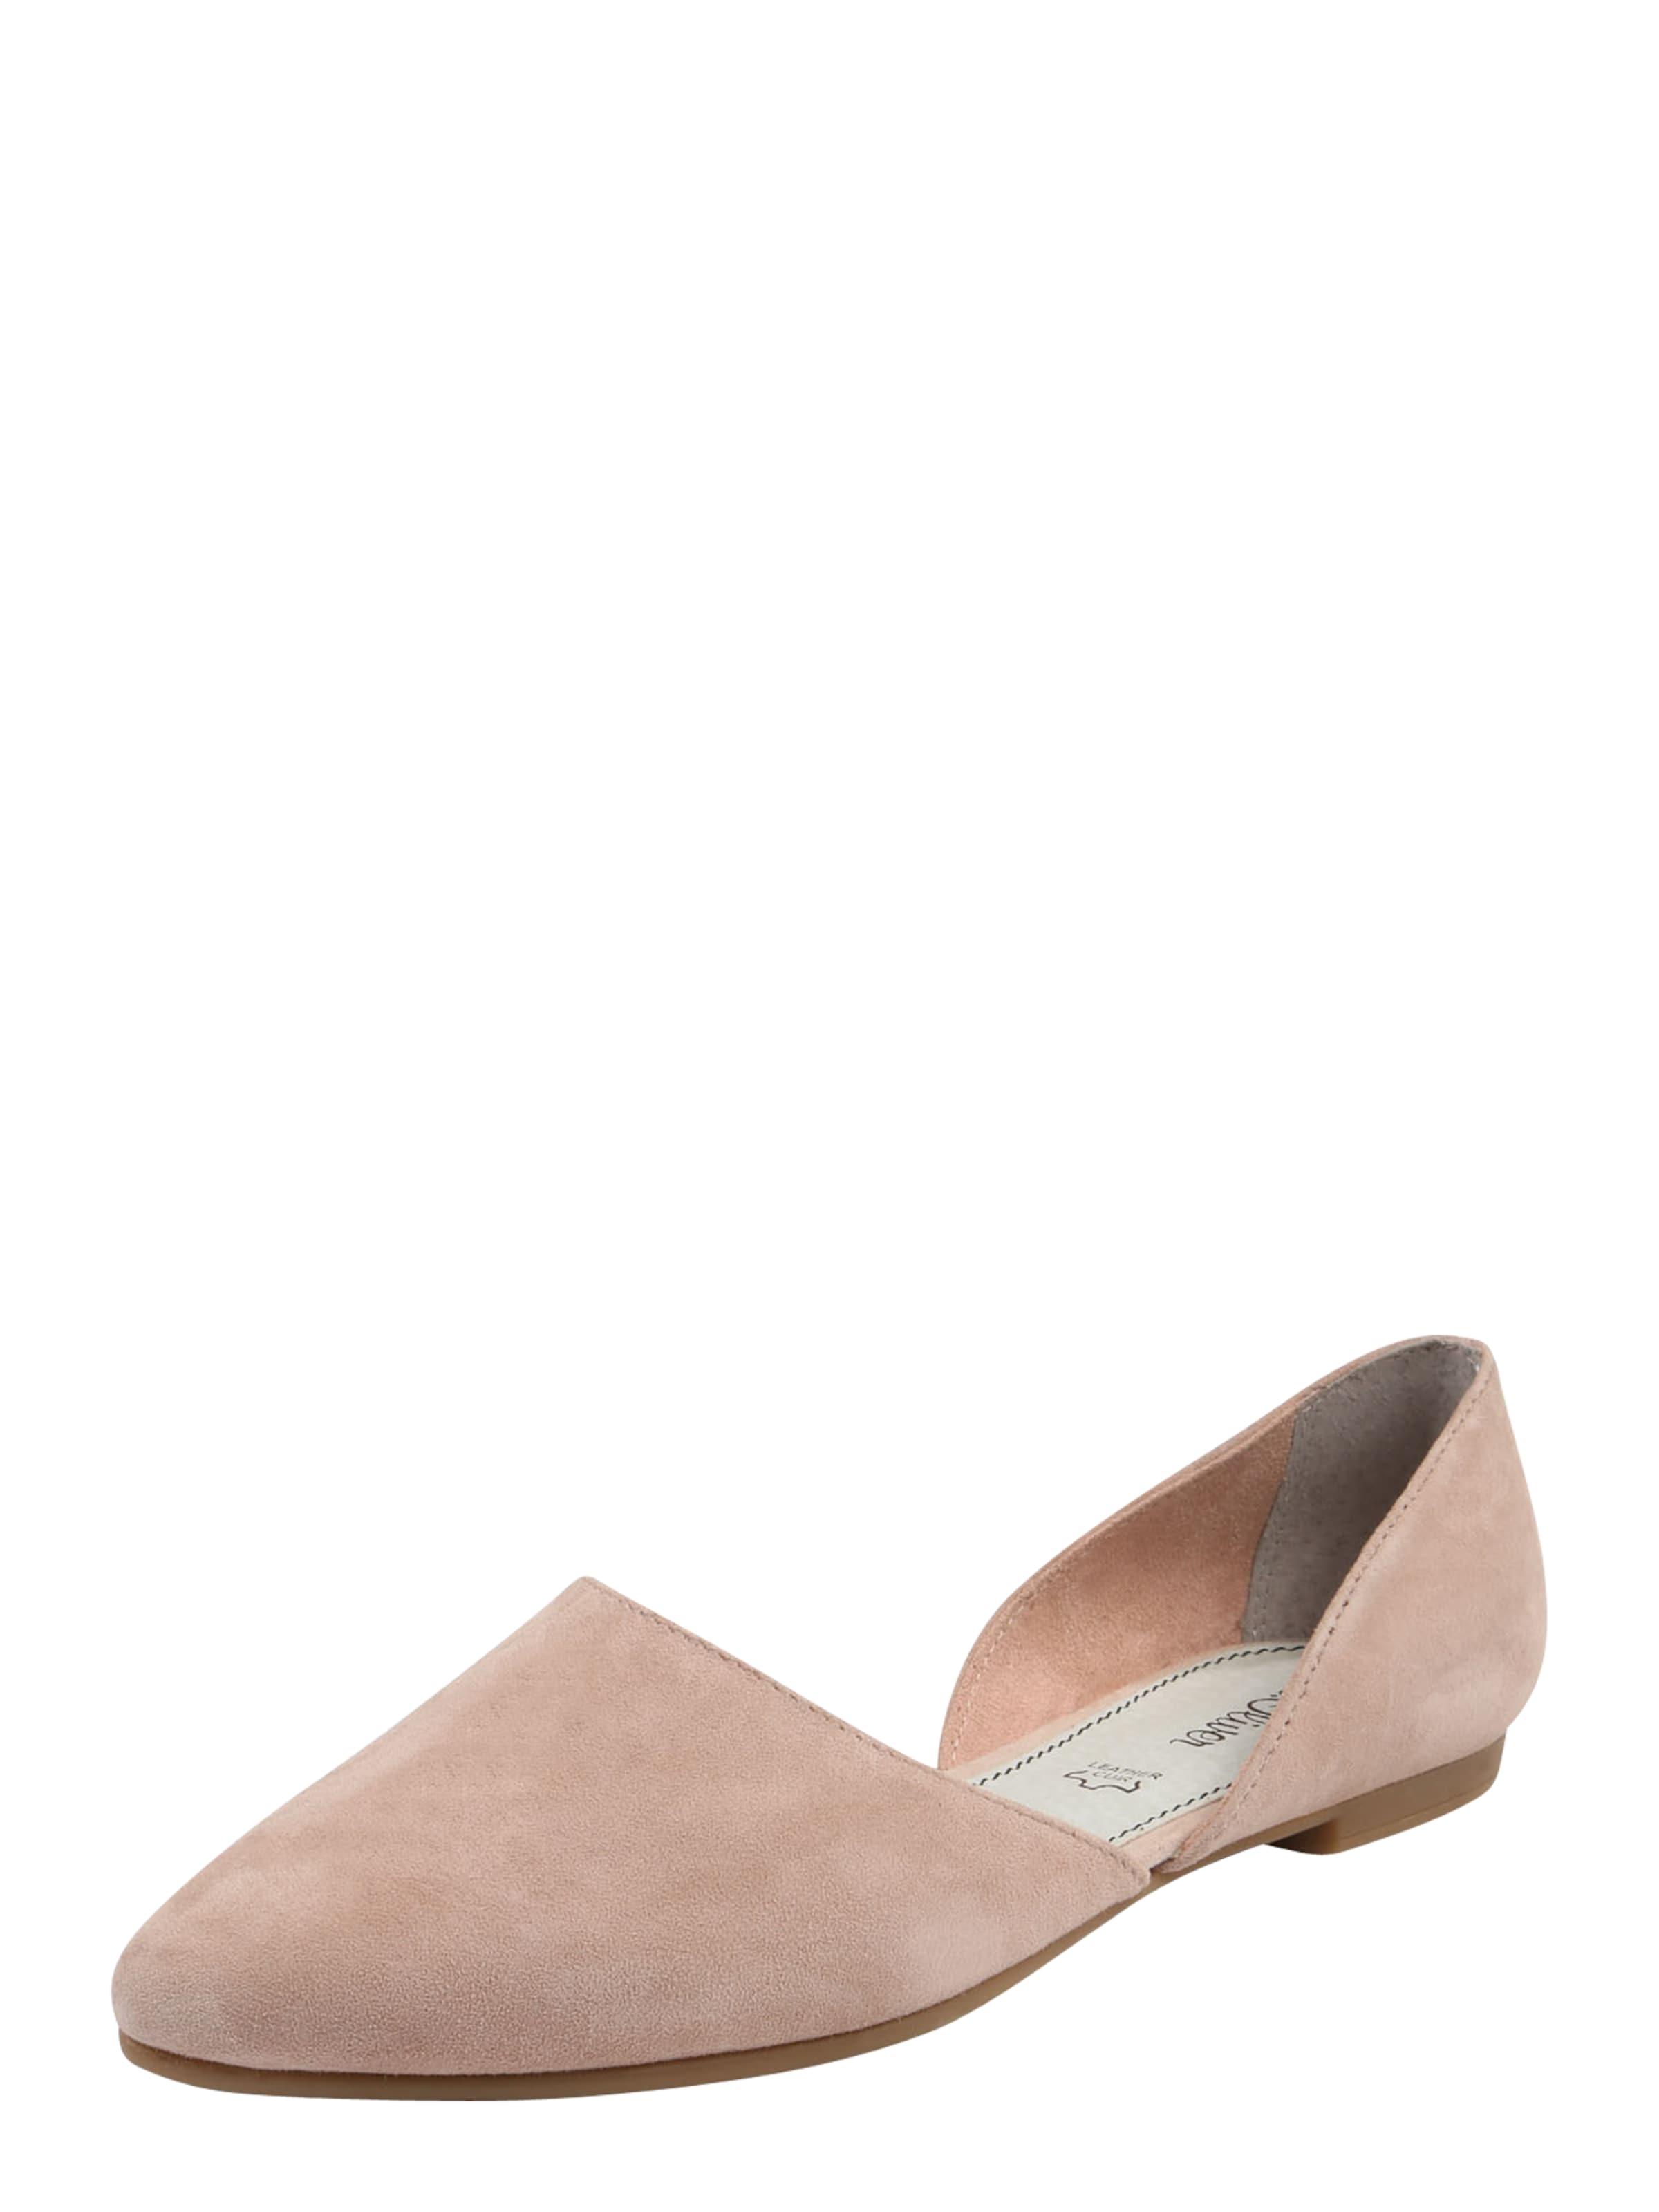 s.Oliver RED LABEL | Ballerina in in Ballerina Veloursleder Schuhe Gut getragene Schuhe eb5ac7